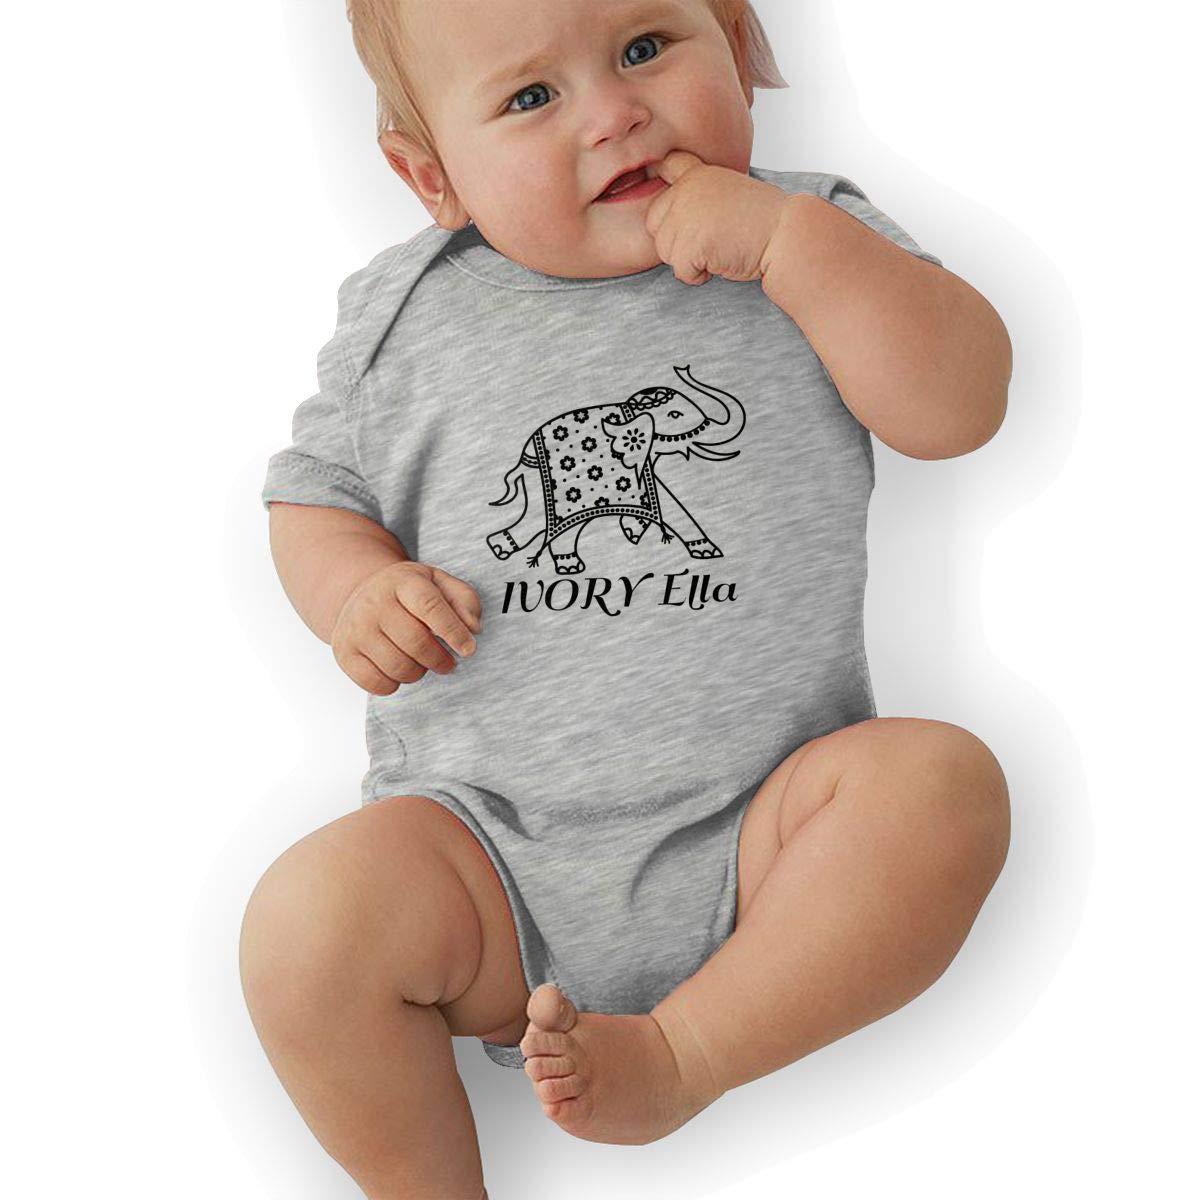 2128d7f0556c97 Amazon.com  Ivory Ella Newborn Infant Toddler Baby Girls Boys Bodysuit Short  Sleeve 0-24 MonthsGray  Clothing